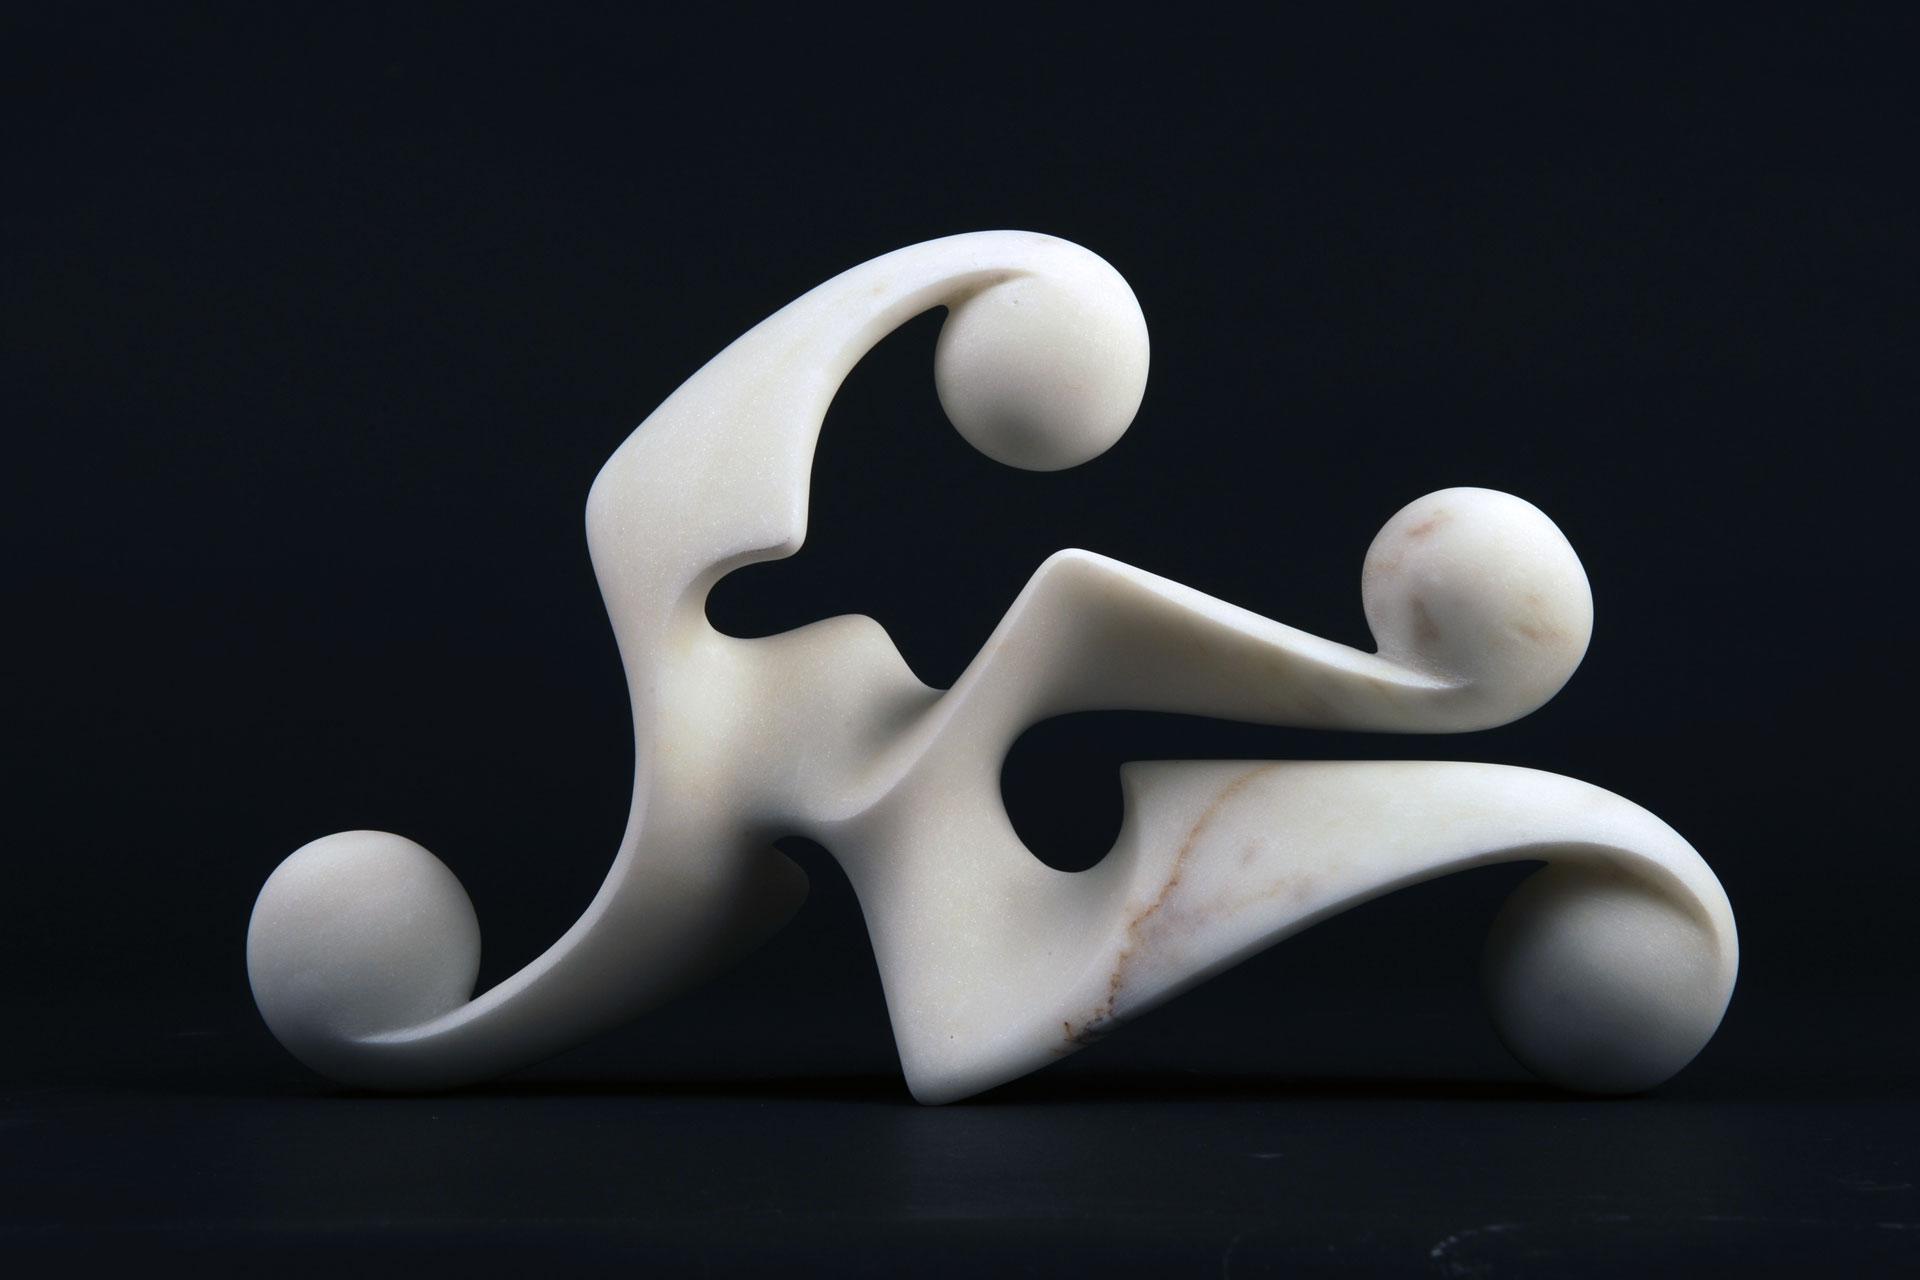 Disgiunto Ondamarina, 2009 - Marmo bianco statuario, cm 22x33x7